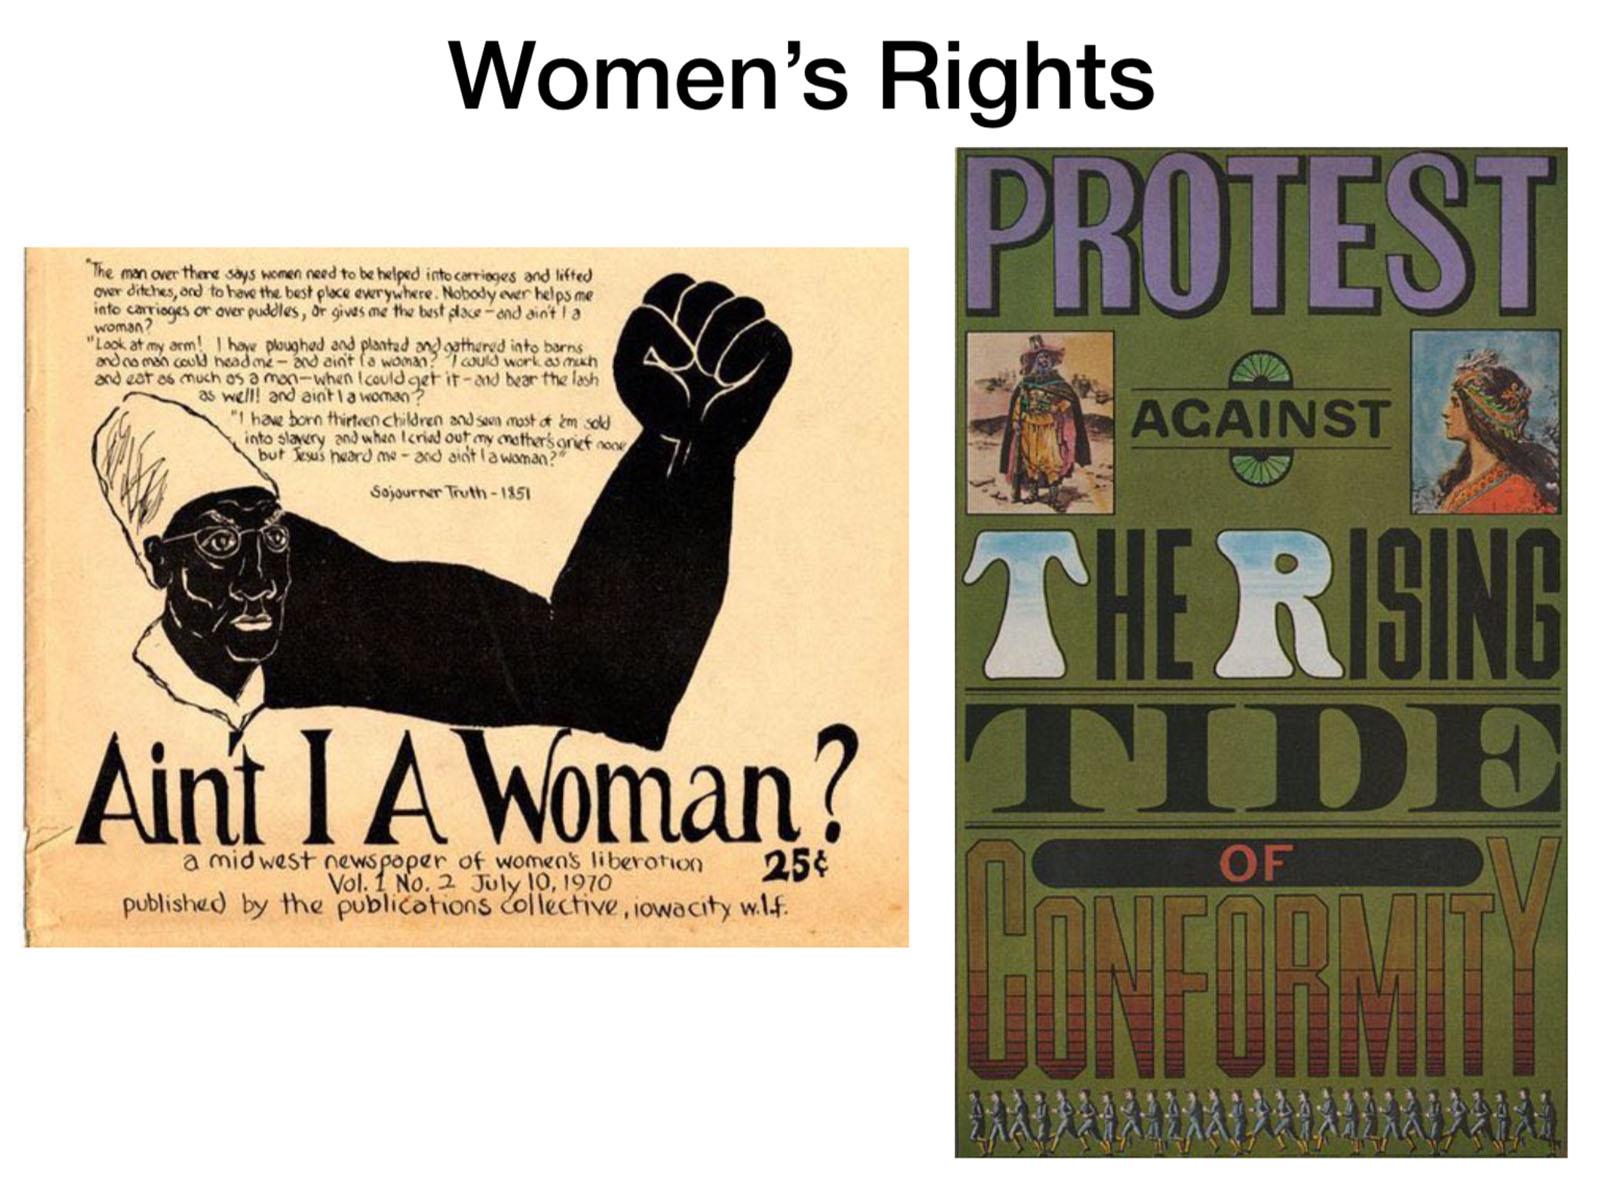 Ape_Bleakney_Print_For_The_People_Women's Rights.jpg